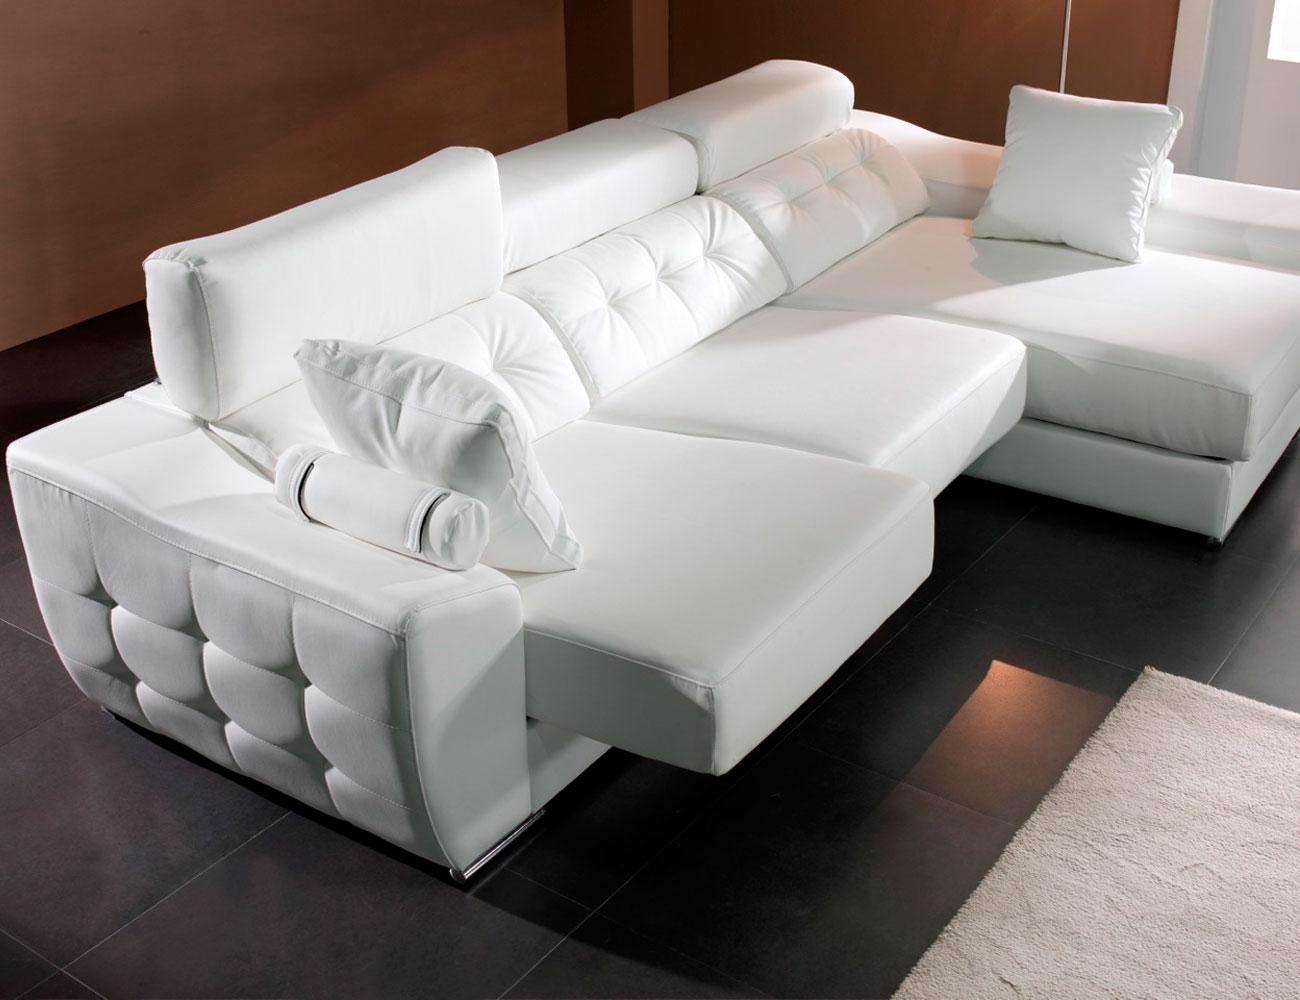 Sofa chaiselongue moderno capitone polipiel blanco2